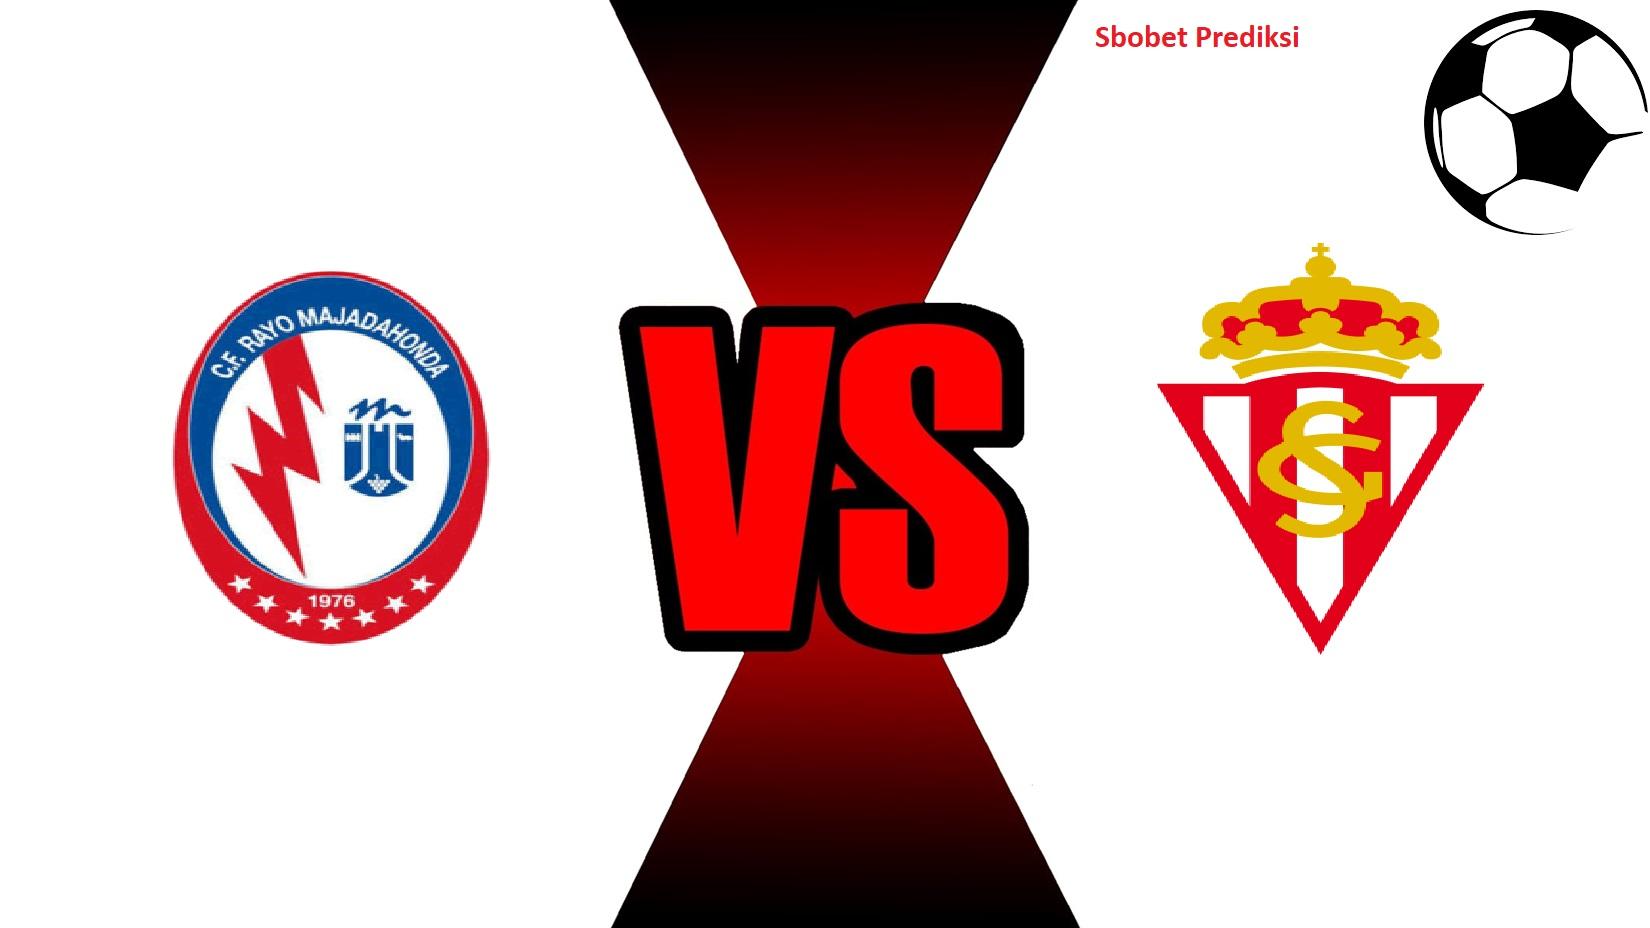 Prediksi Skor Pertandingan Rayo Majadahonda Vs Sporting Gijon 19 Oktober 2018